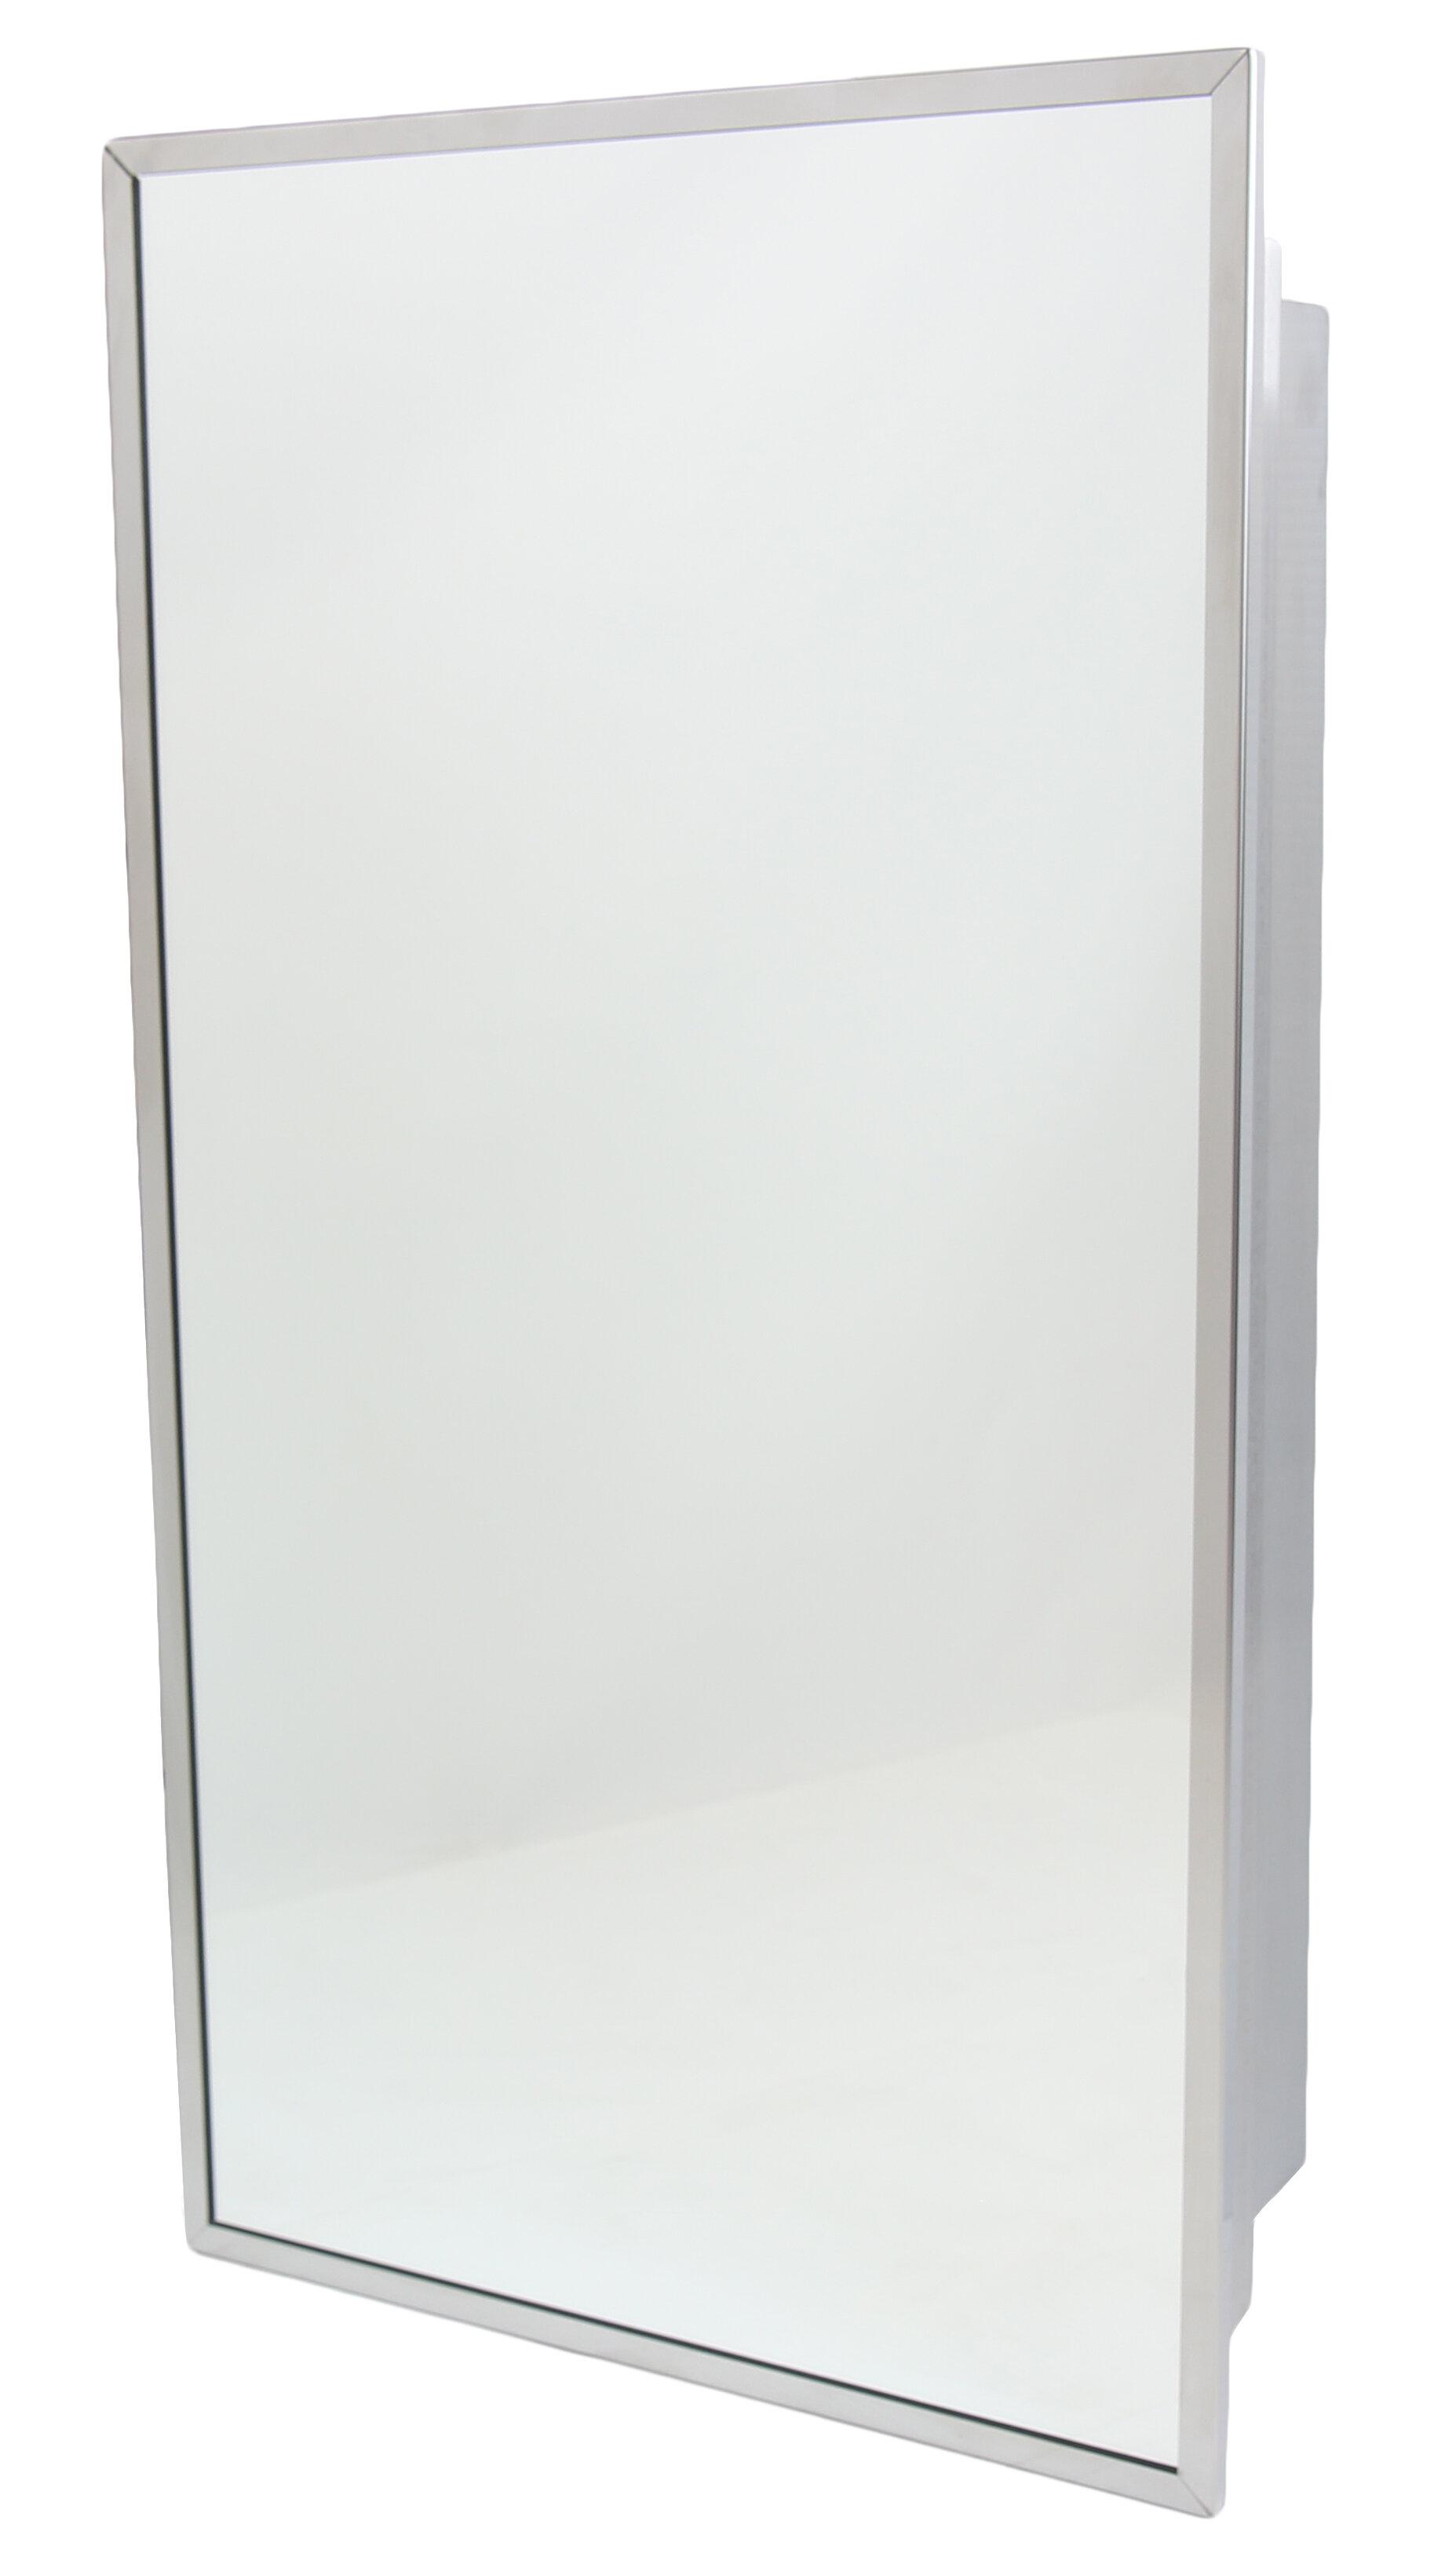 wayfair improvement cabinet robern recessed medicine or series x home surface pdx uplift mount